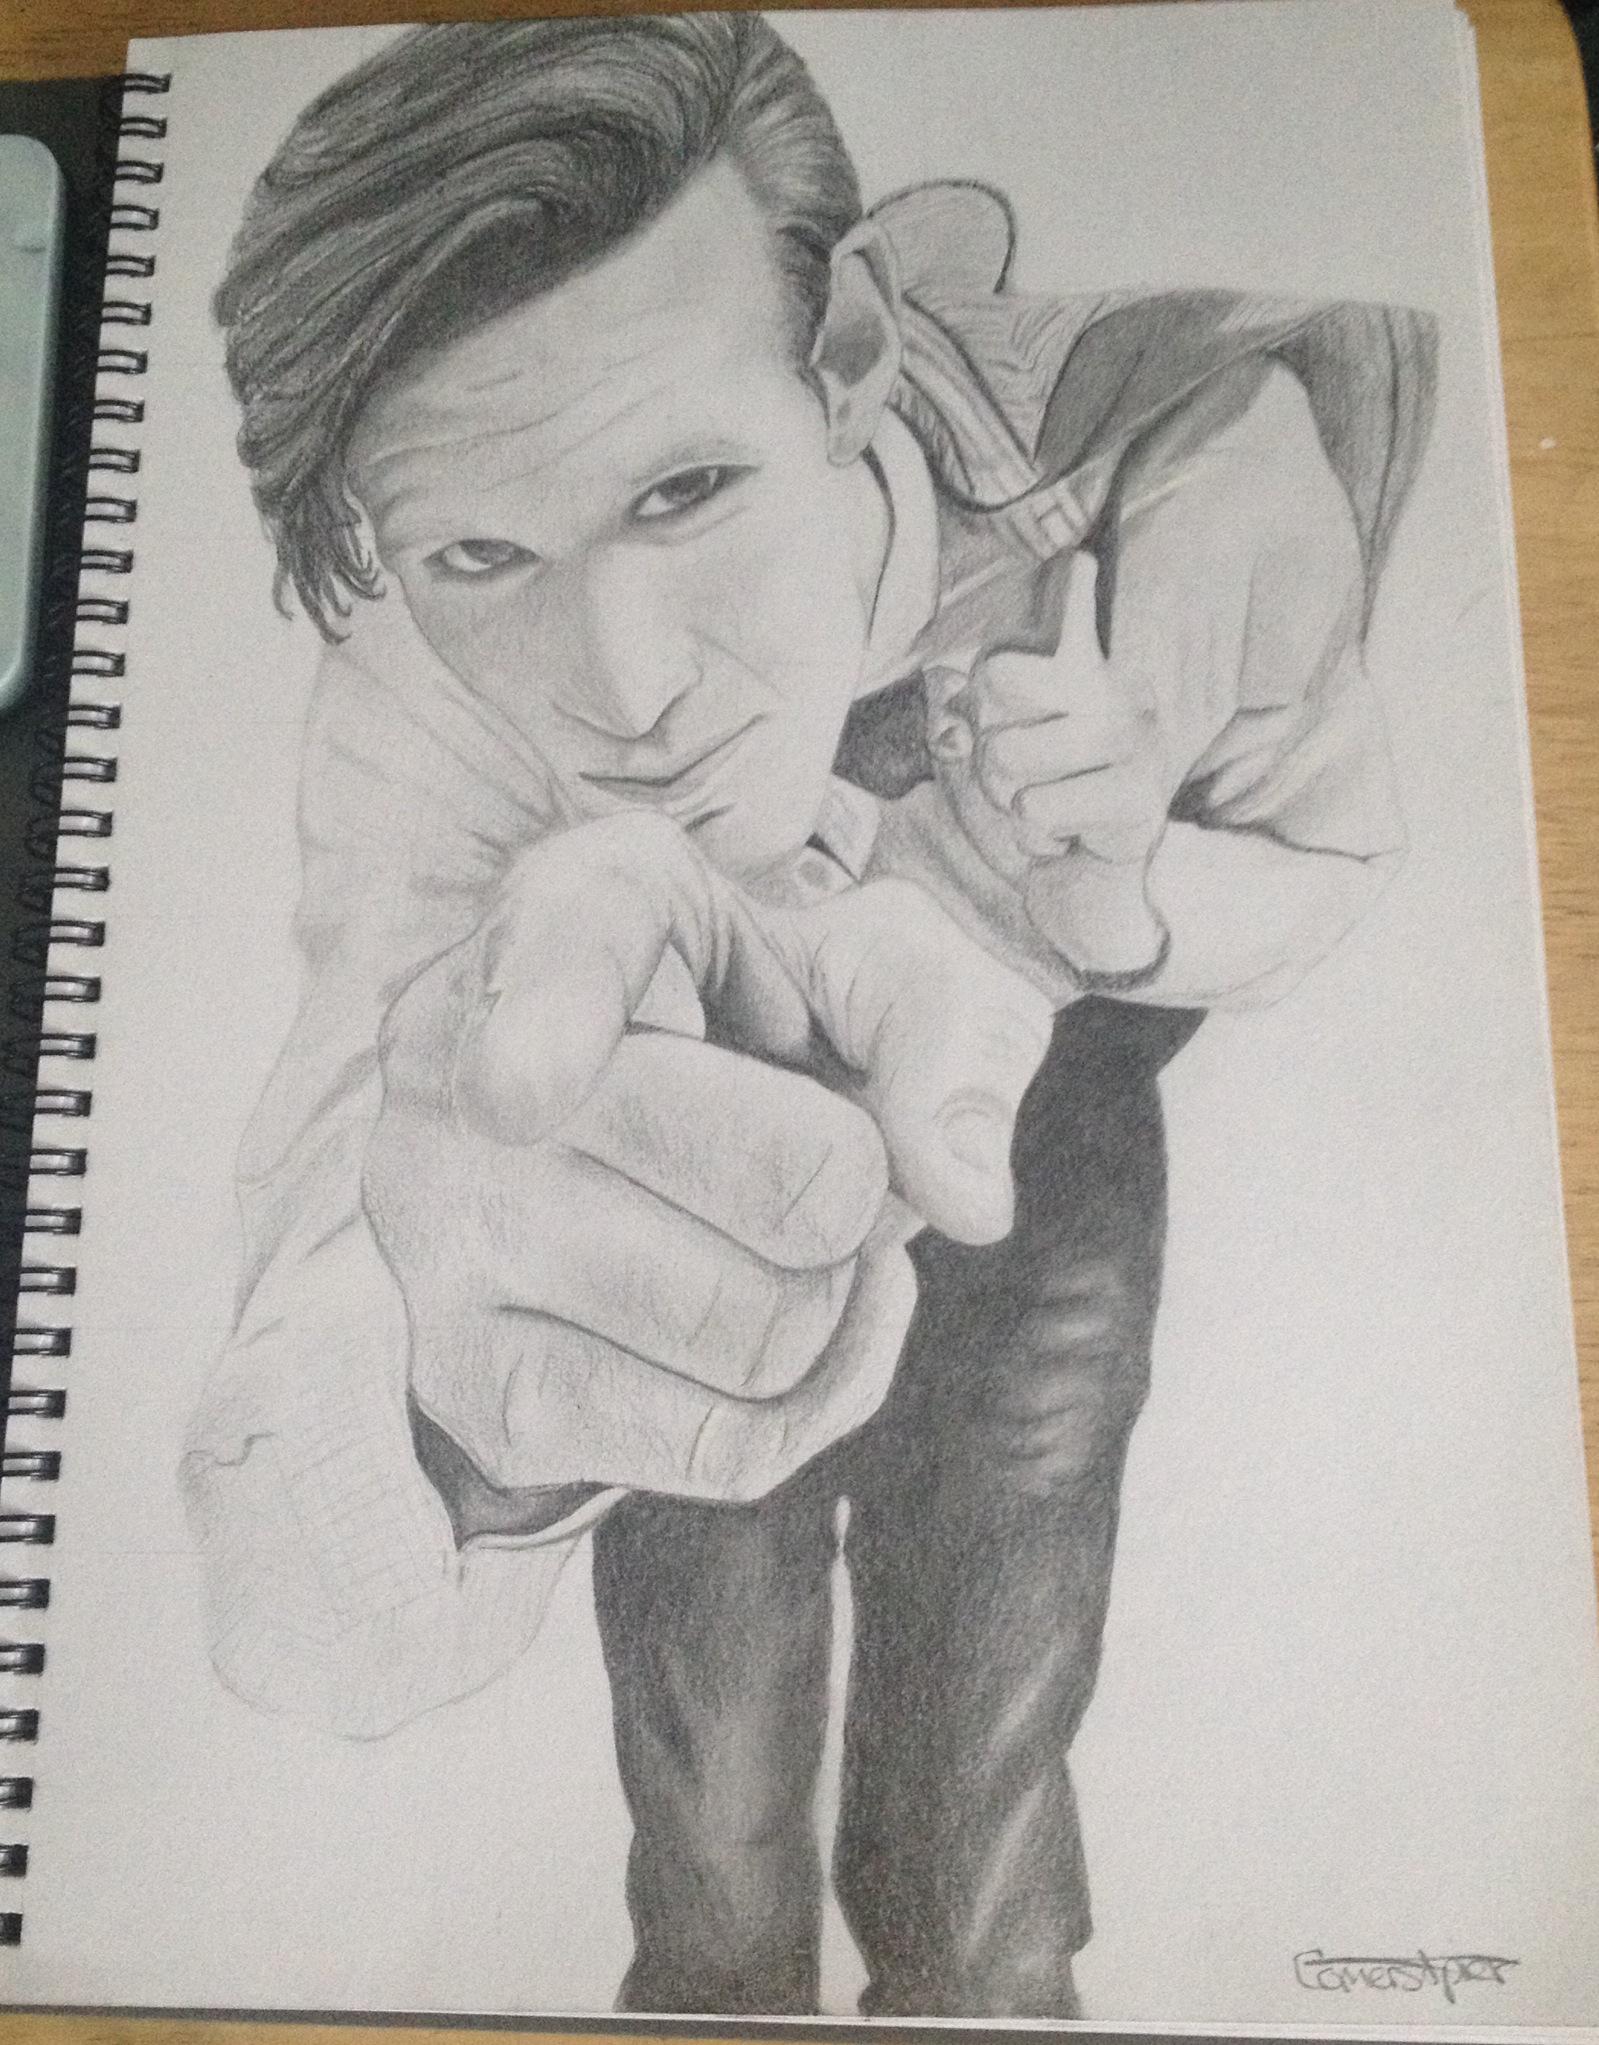 1599x2045 Matt Smith Doctor Who Drawing Geek Matt Smith